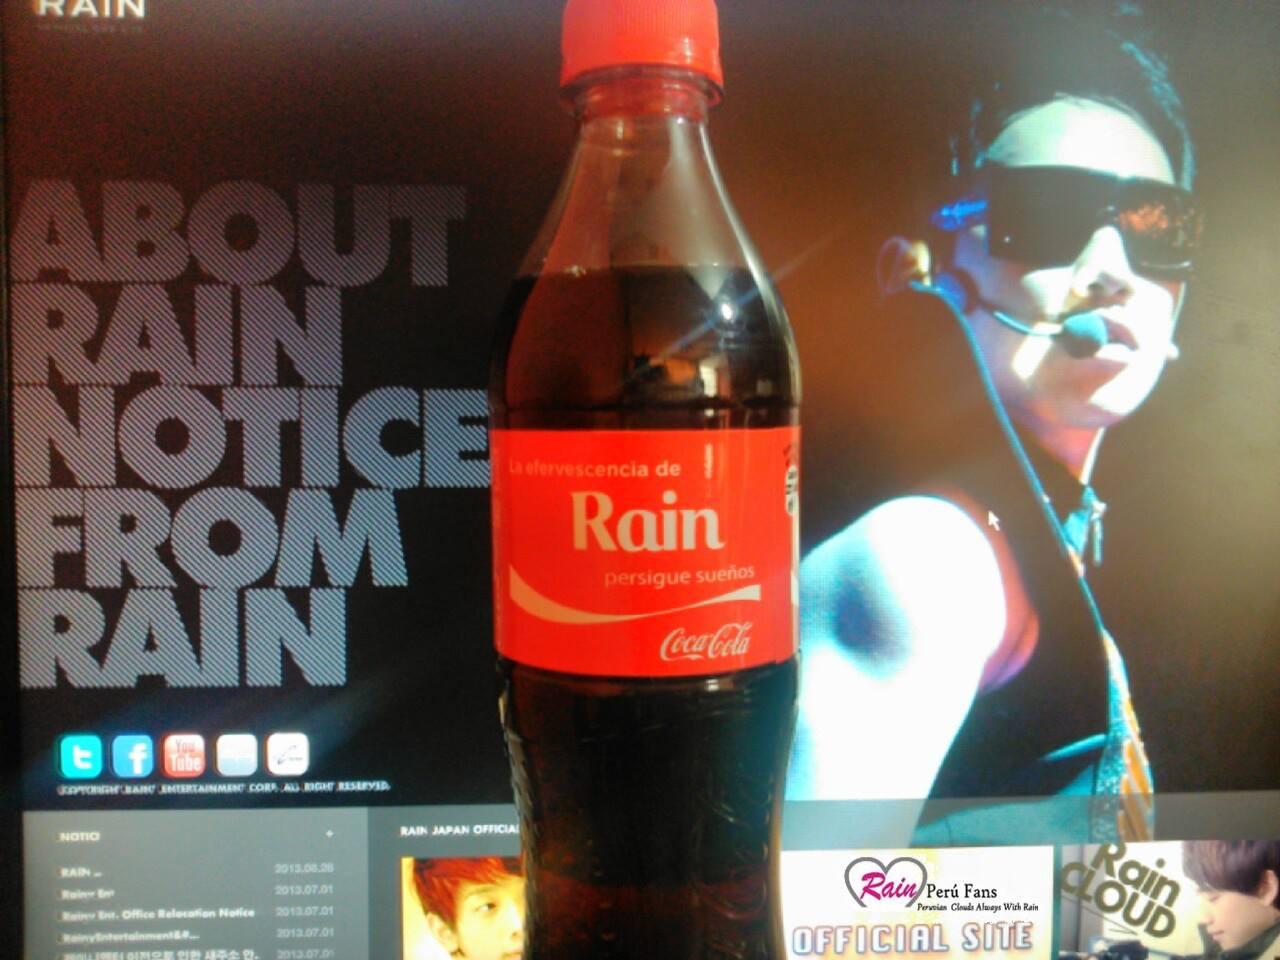 RAIN、上海メンソレータムのイベントに登場!_c0047605_14562854.jpg